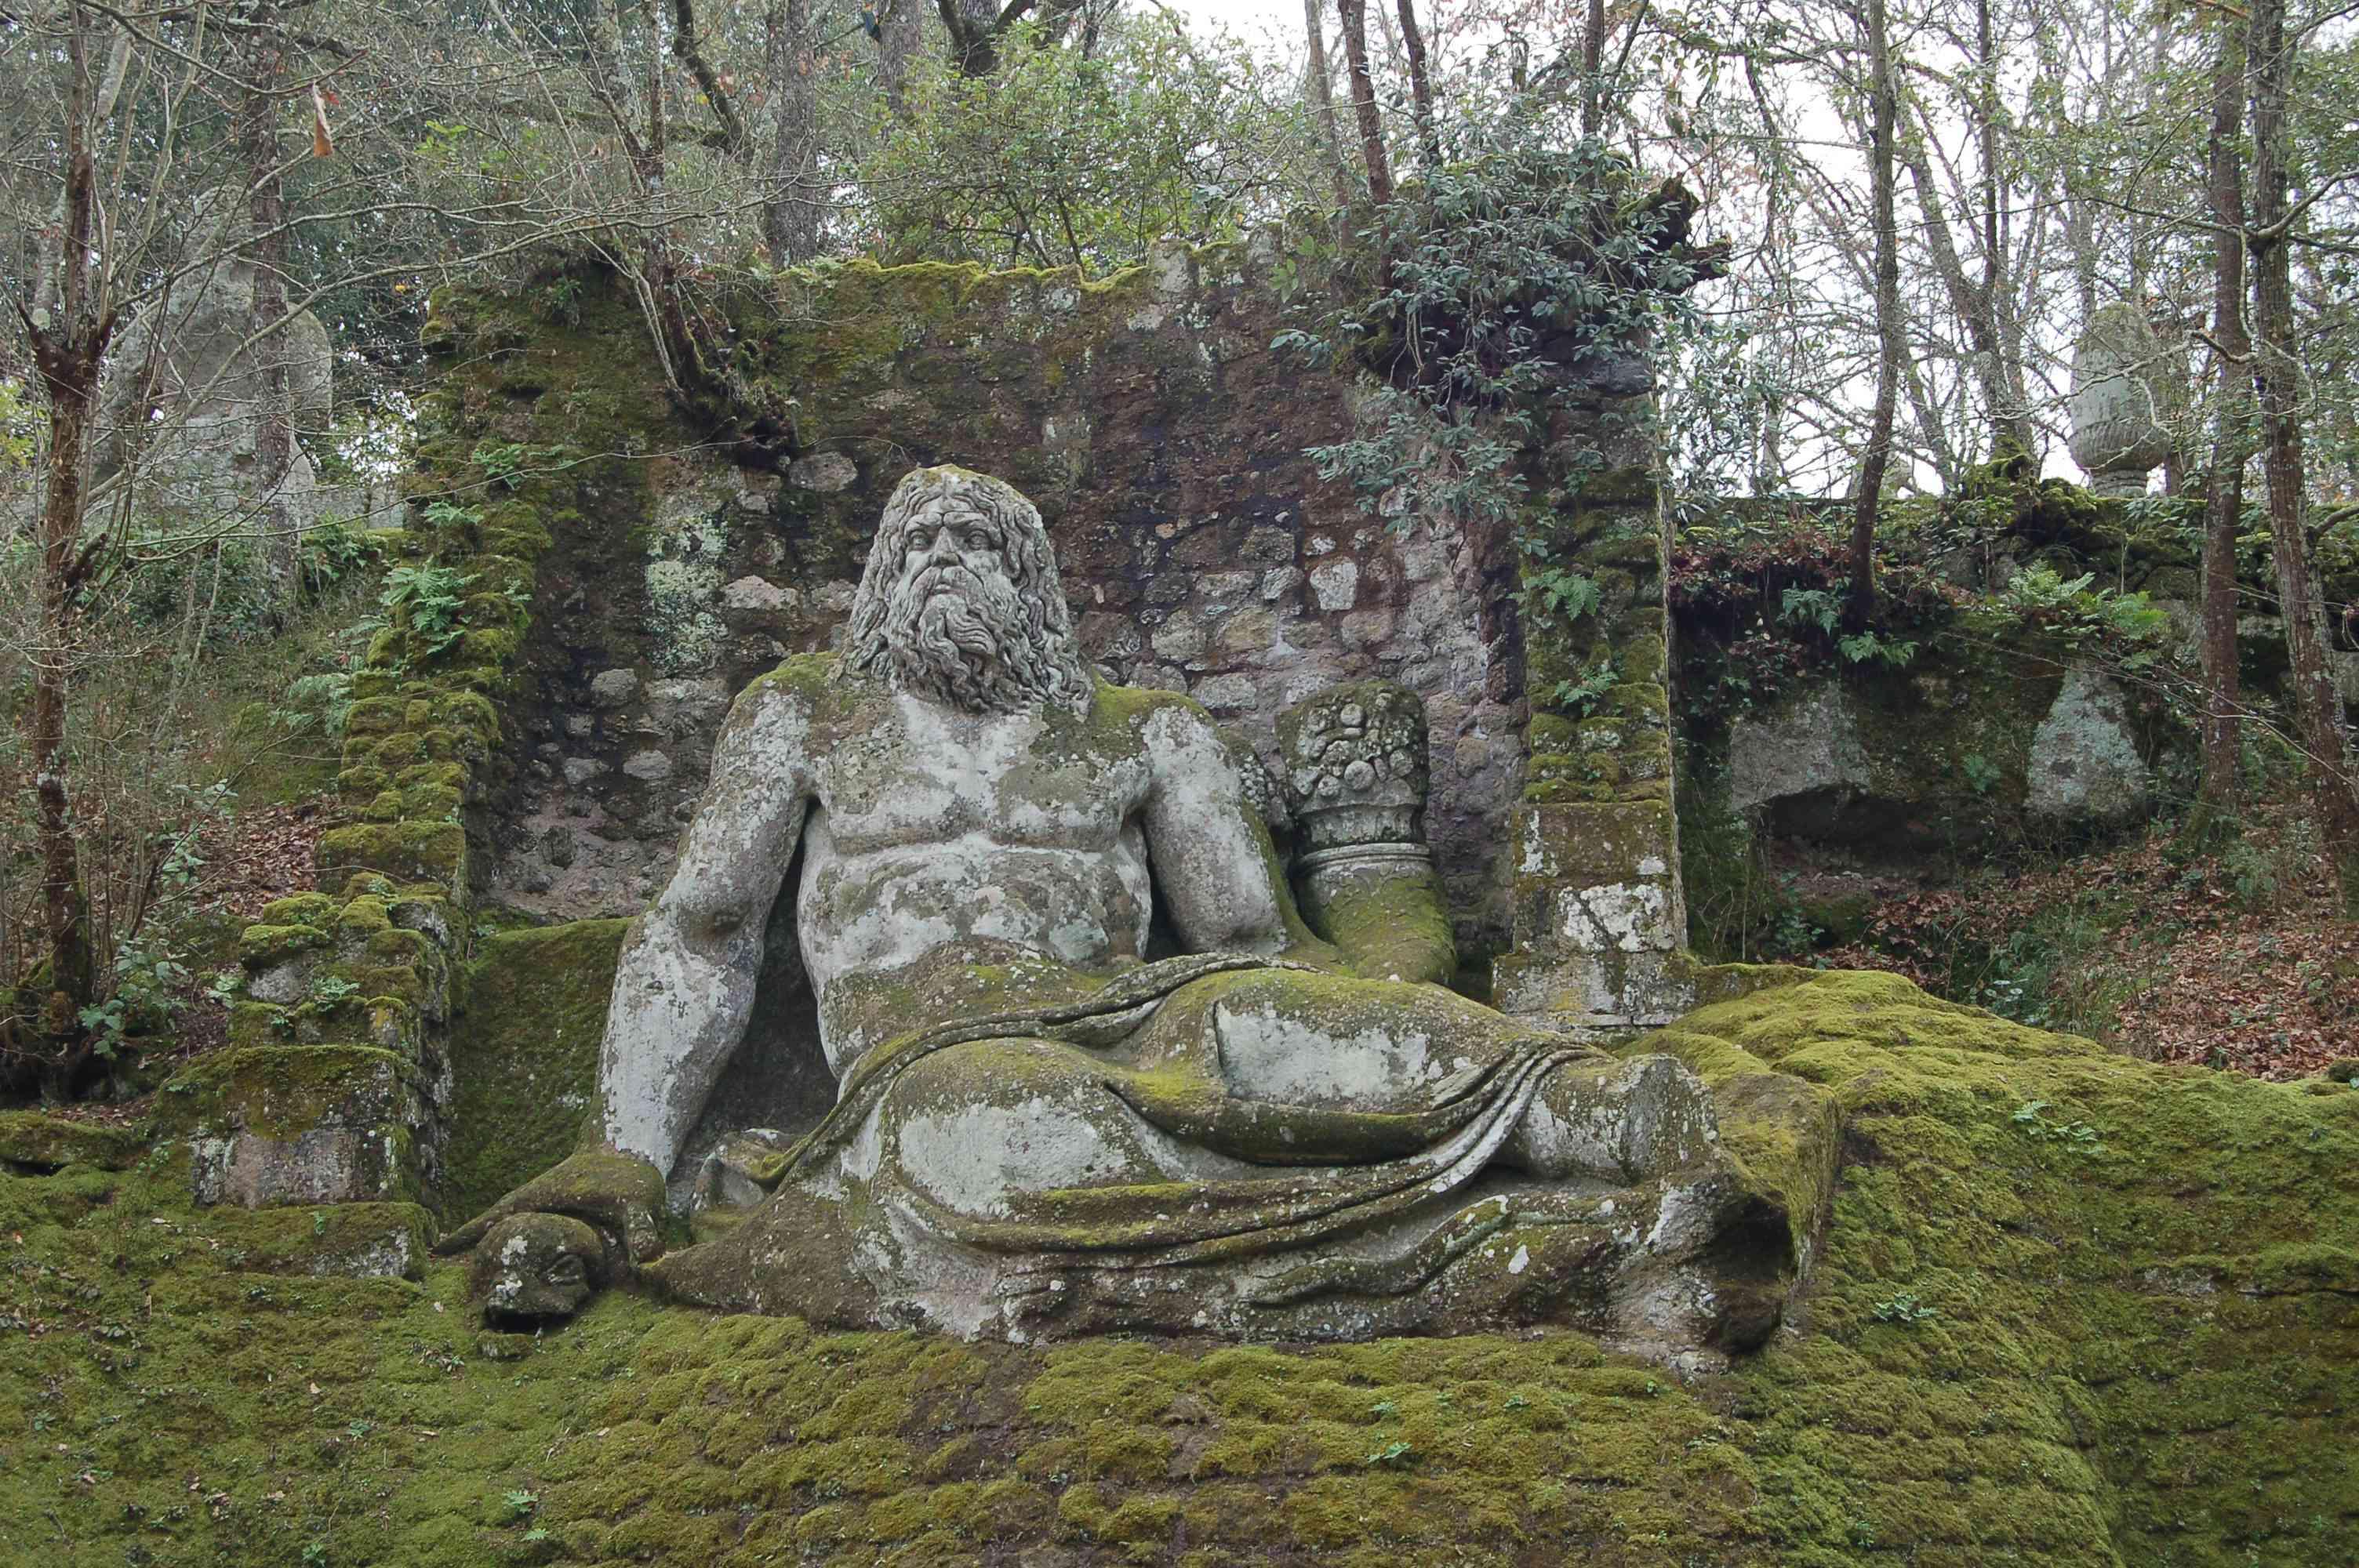 Neptune statue at in the Sacro Bosco in Park of the Monsters, Bomarzo, Viterbo, Italy